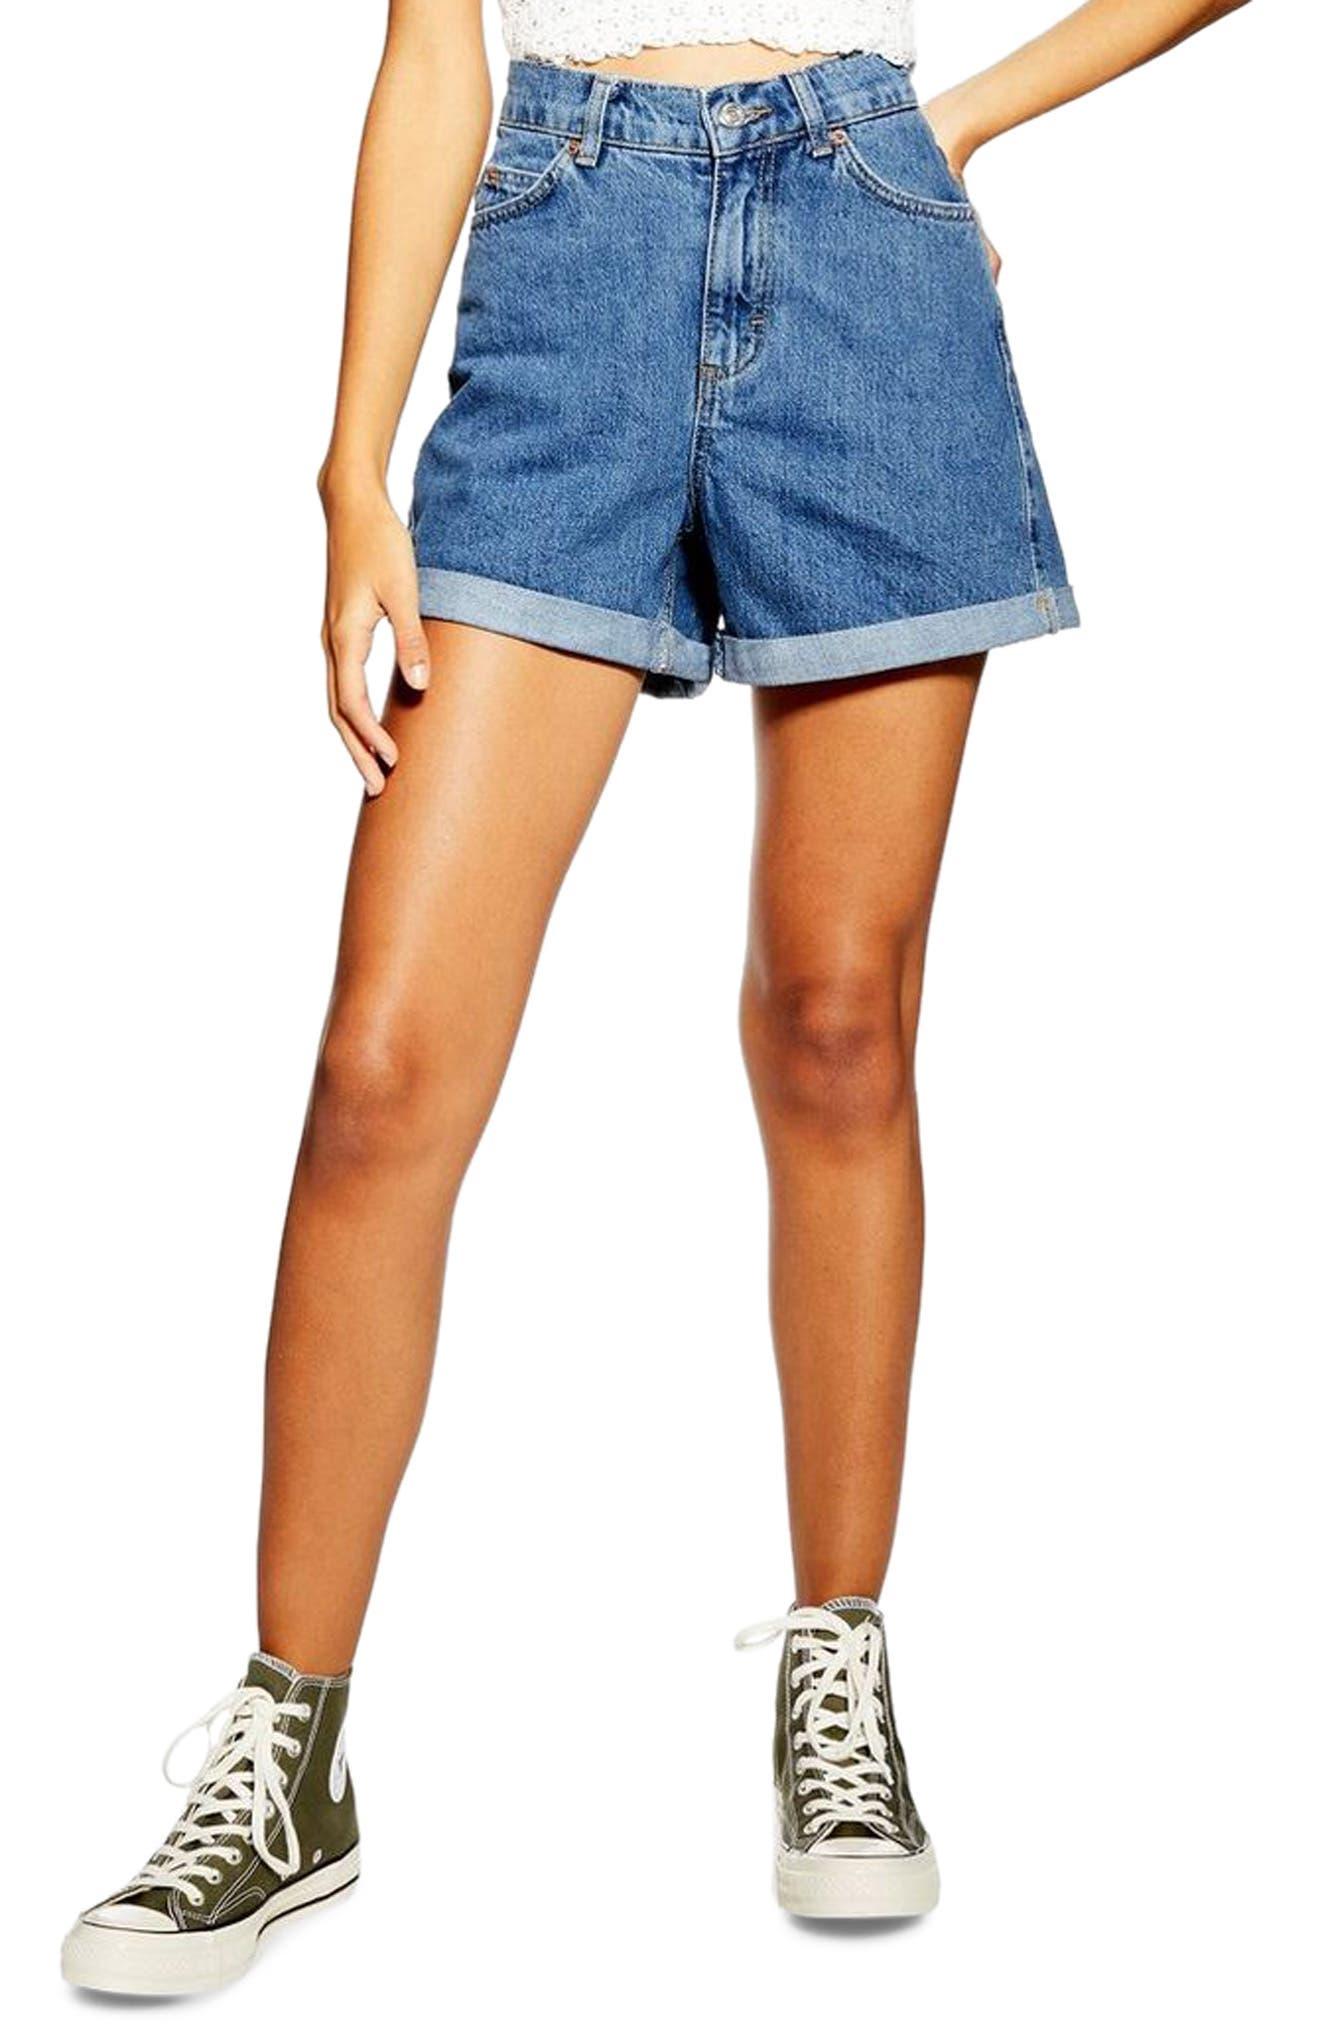 Vintage Shorts, Culottes,  Capris History Womens Topshop Roll Cuff Denim Mom Shorts $60.00 AT vintagedancer.com